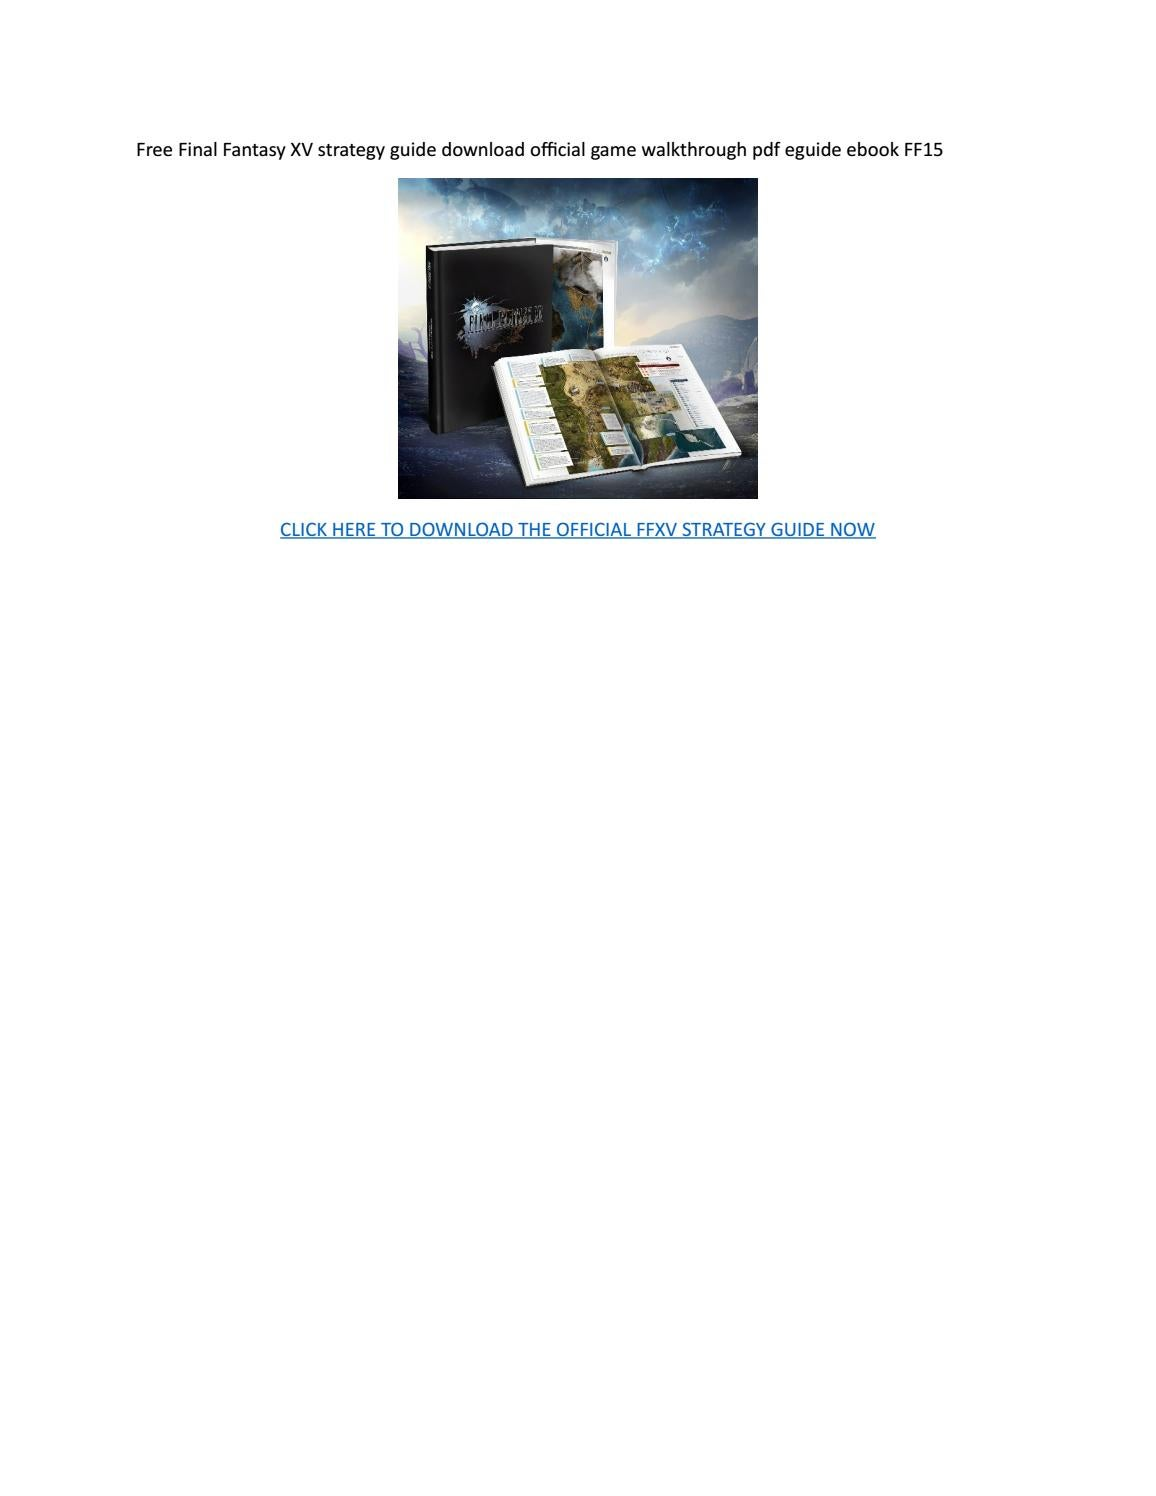 download final fantasy xv official guide torrent